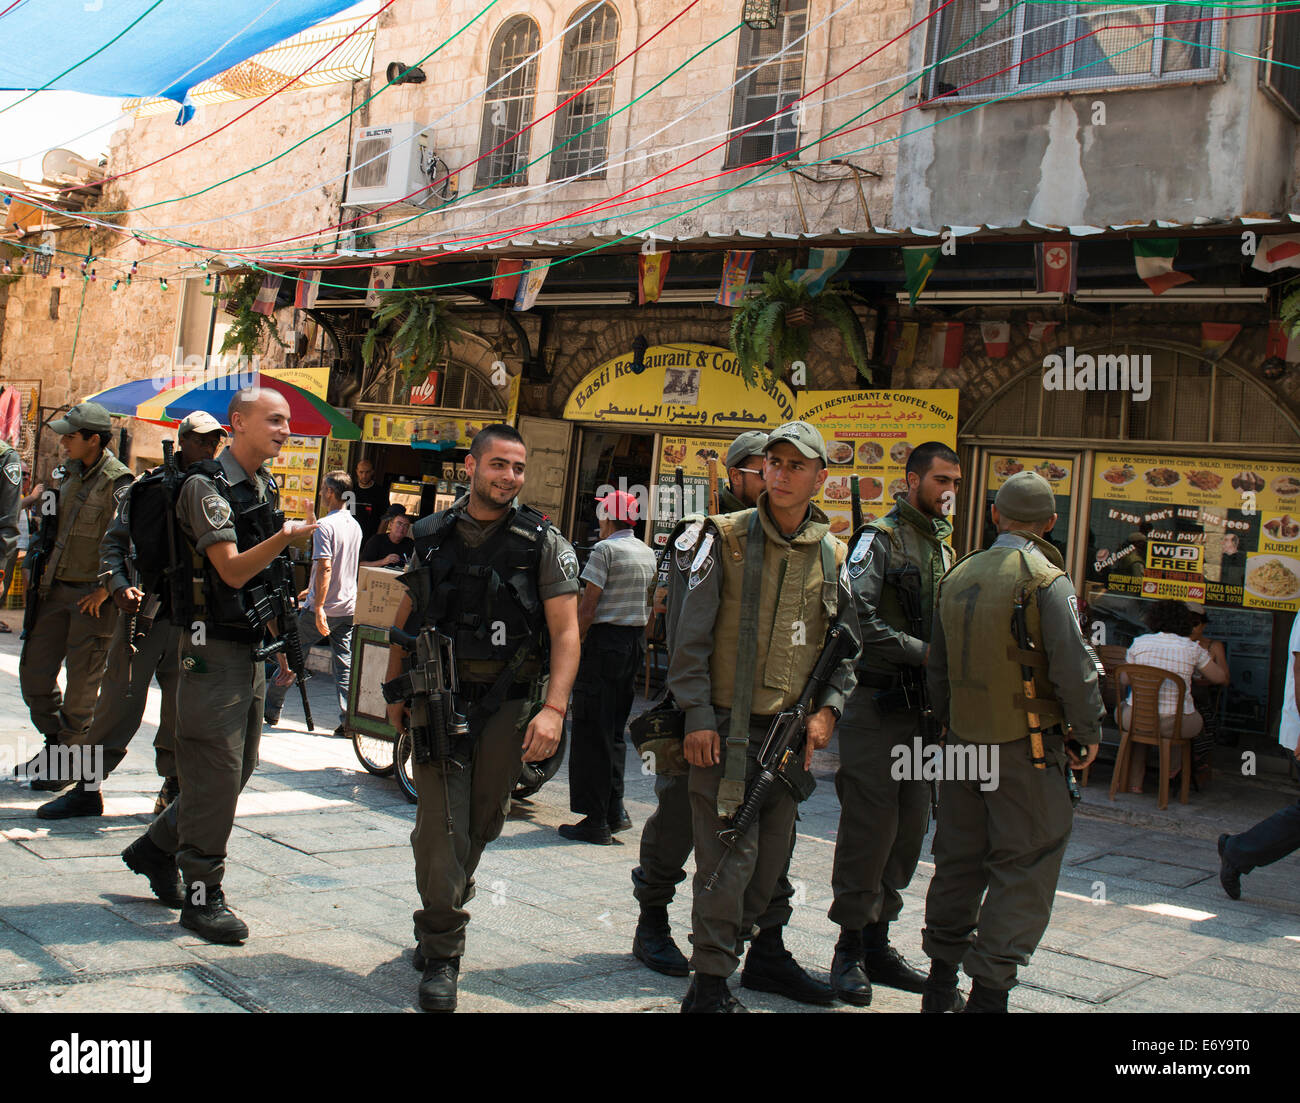 Israeli border policemen on duty in the Muslim quarter in the old city of Jerusalem. - Stock Image